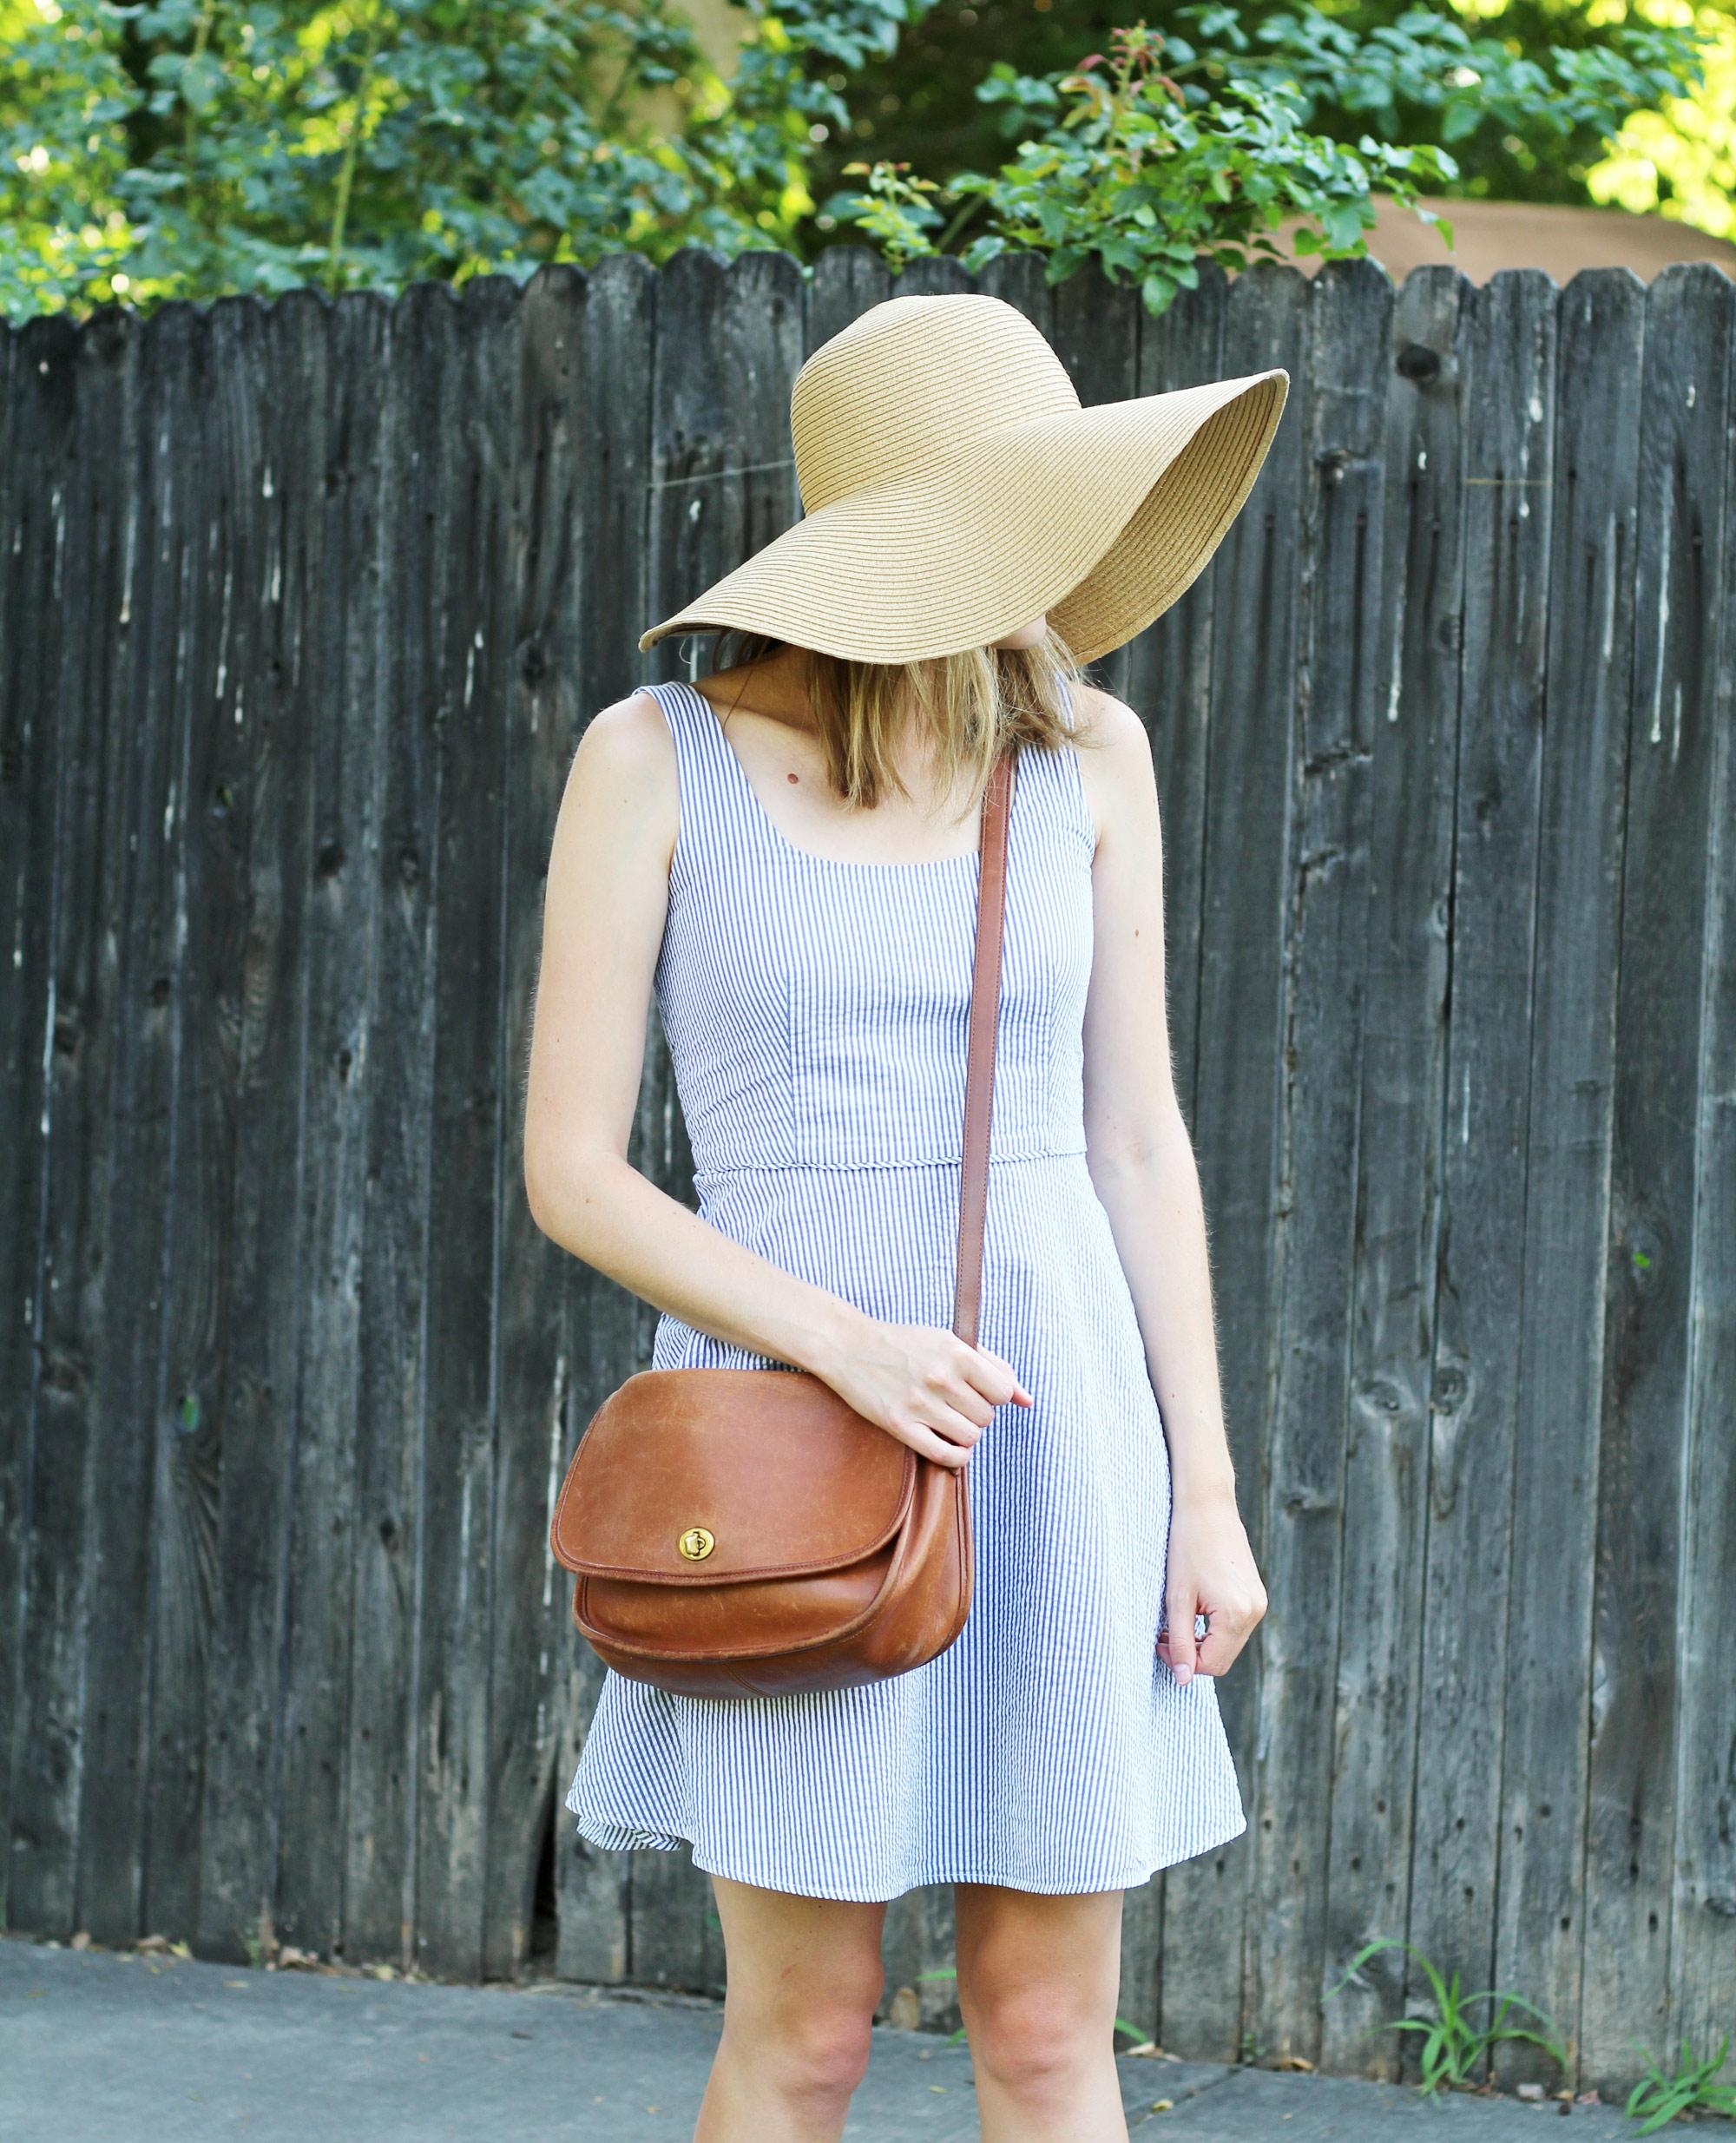 Floppy sun hat with seersucker dress and vintage Coach bag — Cotton Cashmere Cat Hair